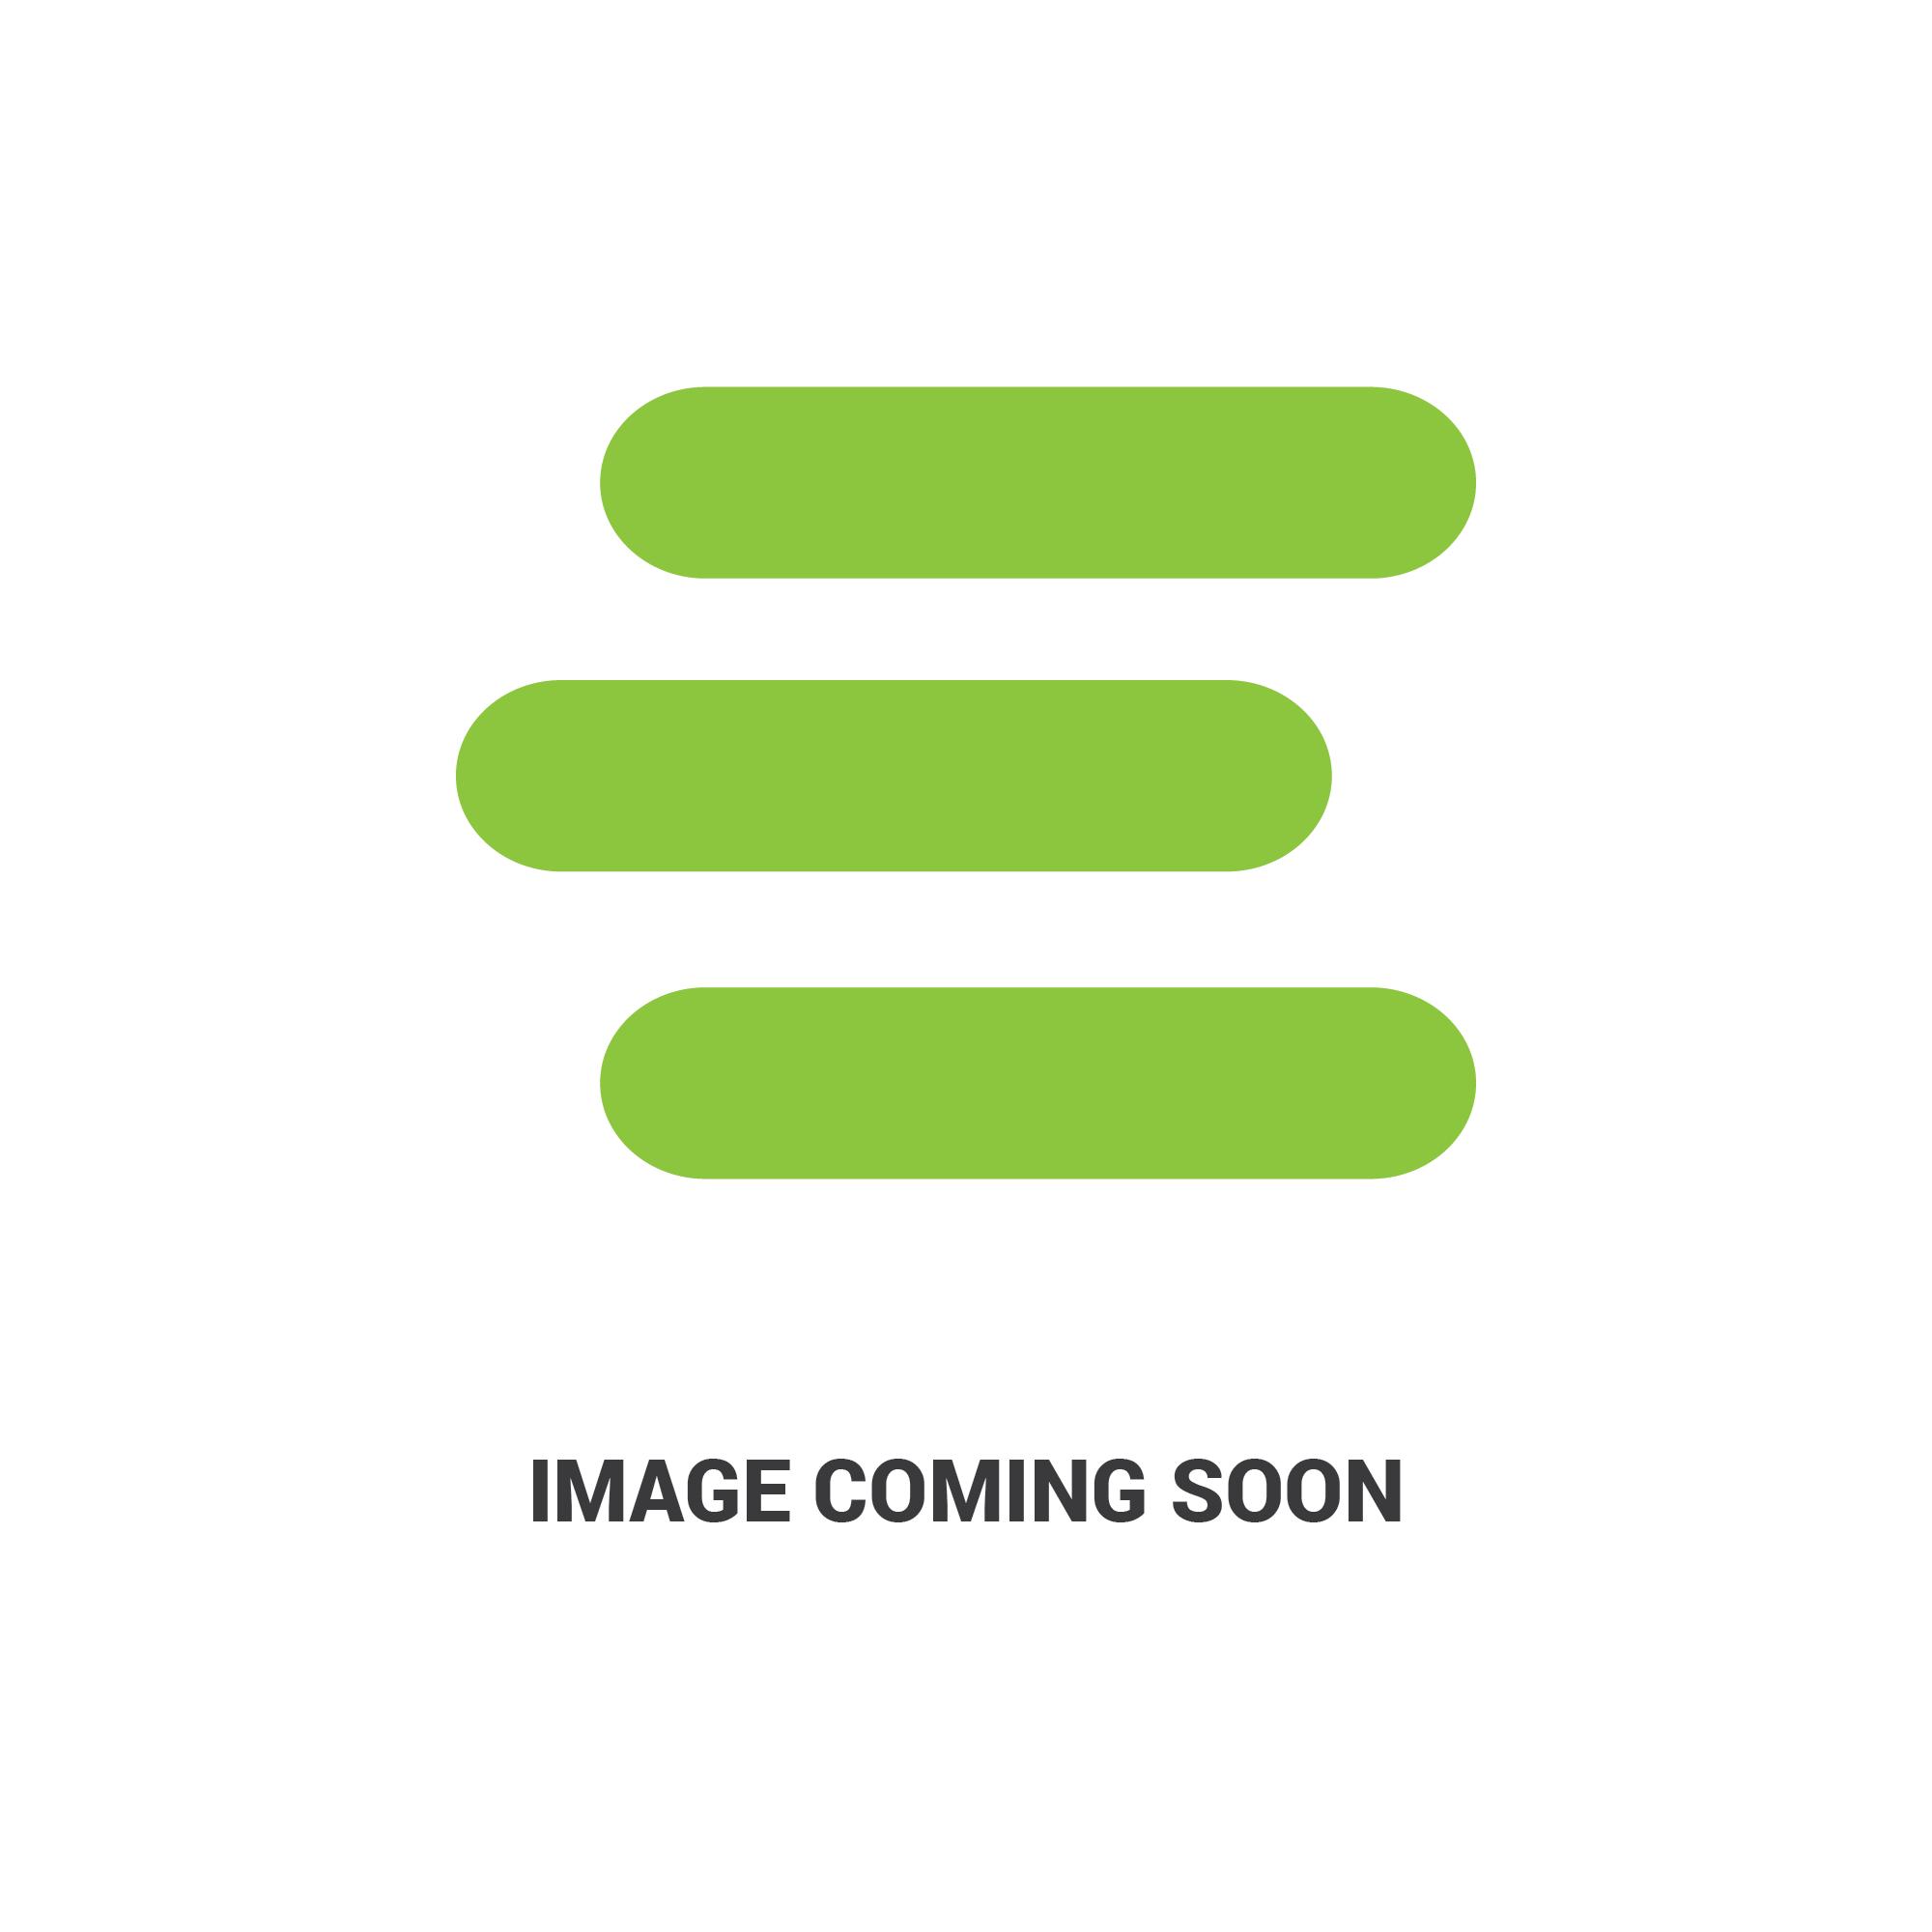 E-6889272edit 1.jpg